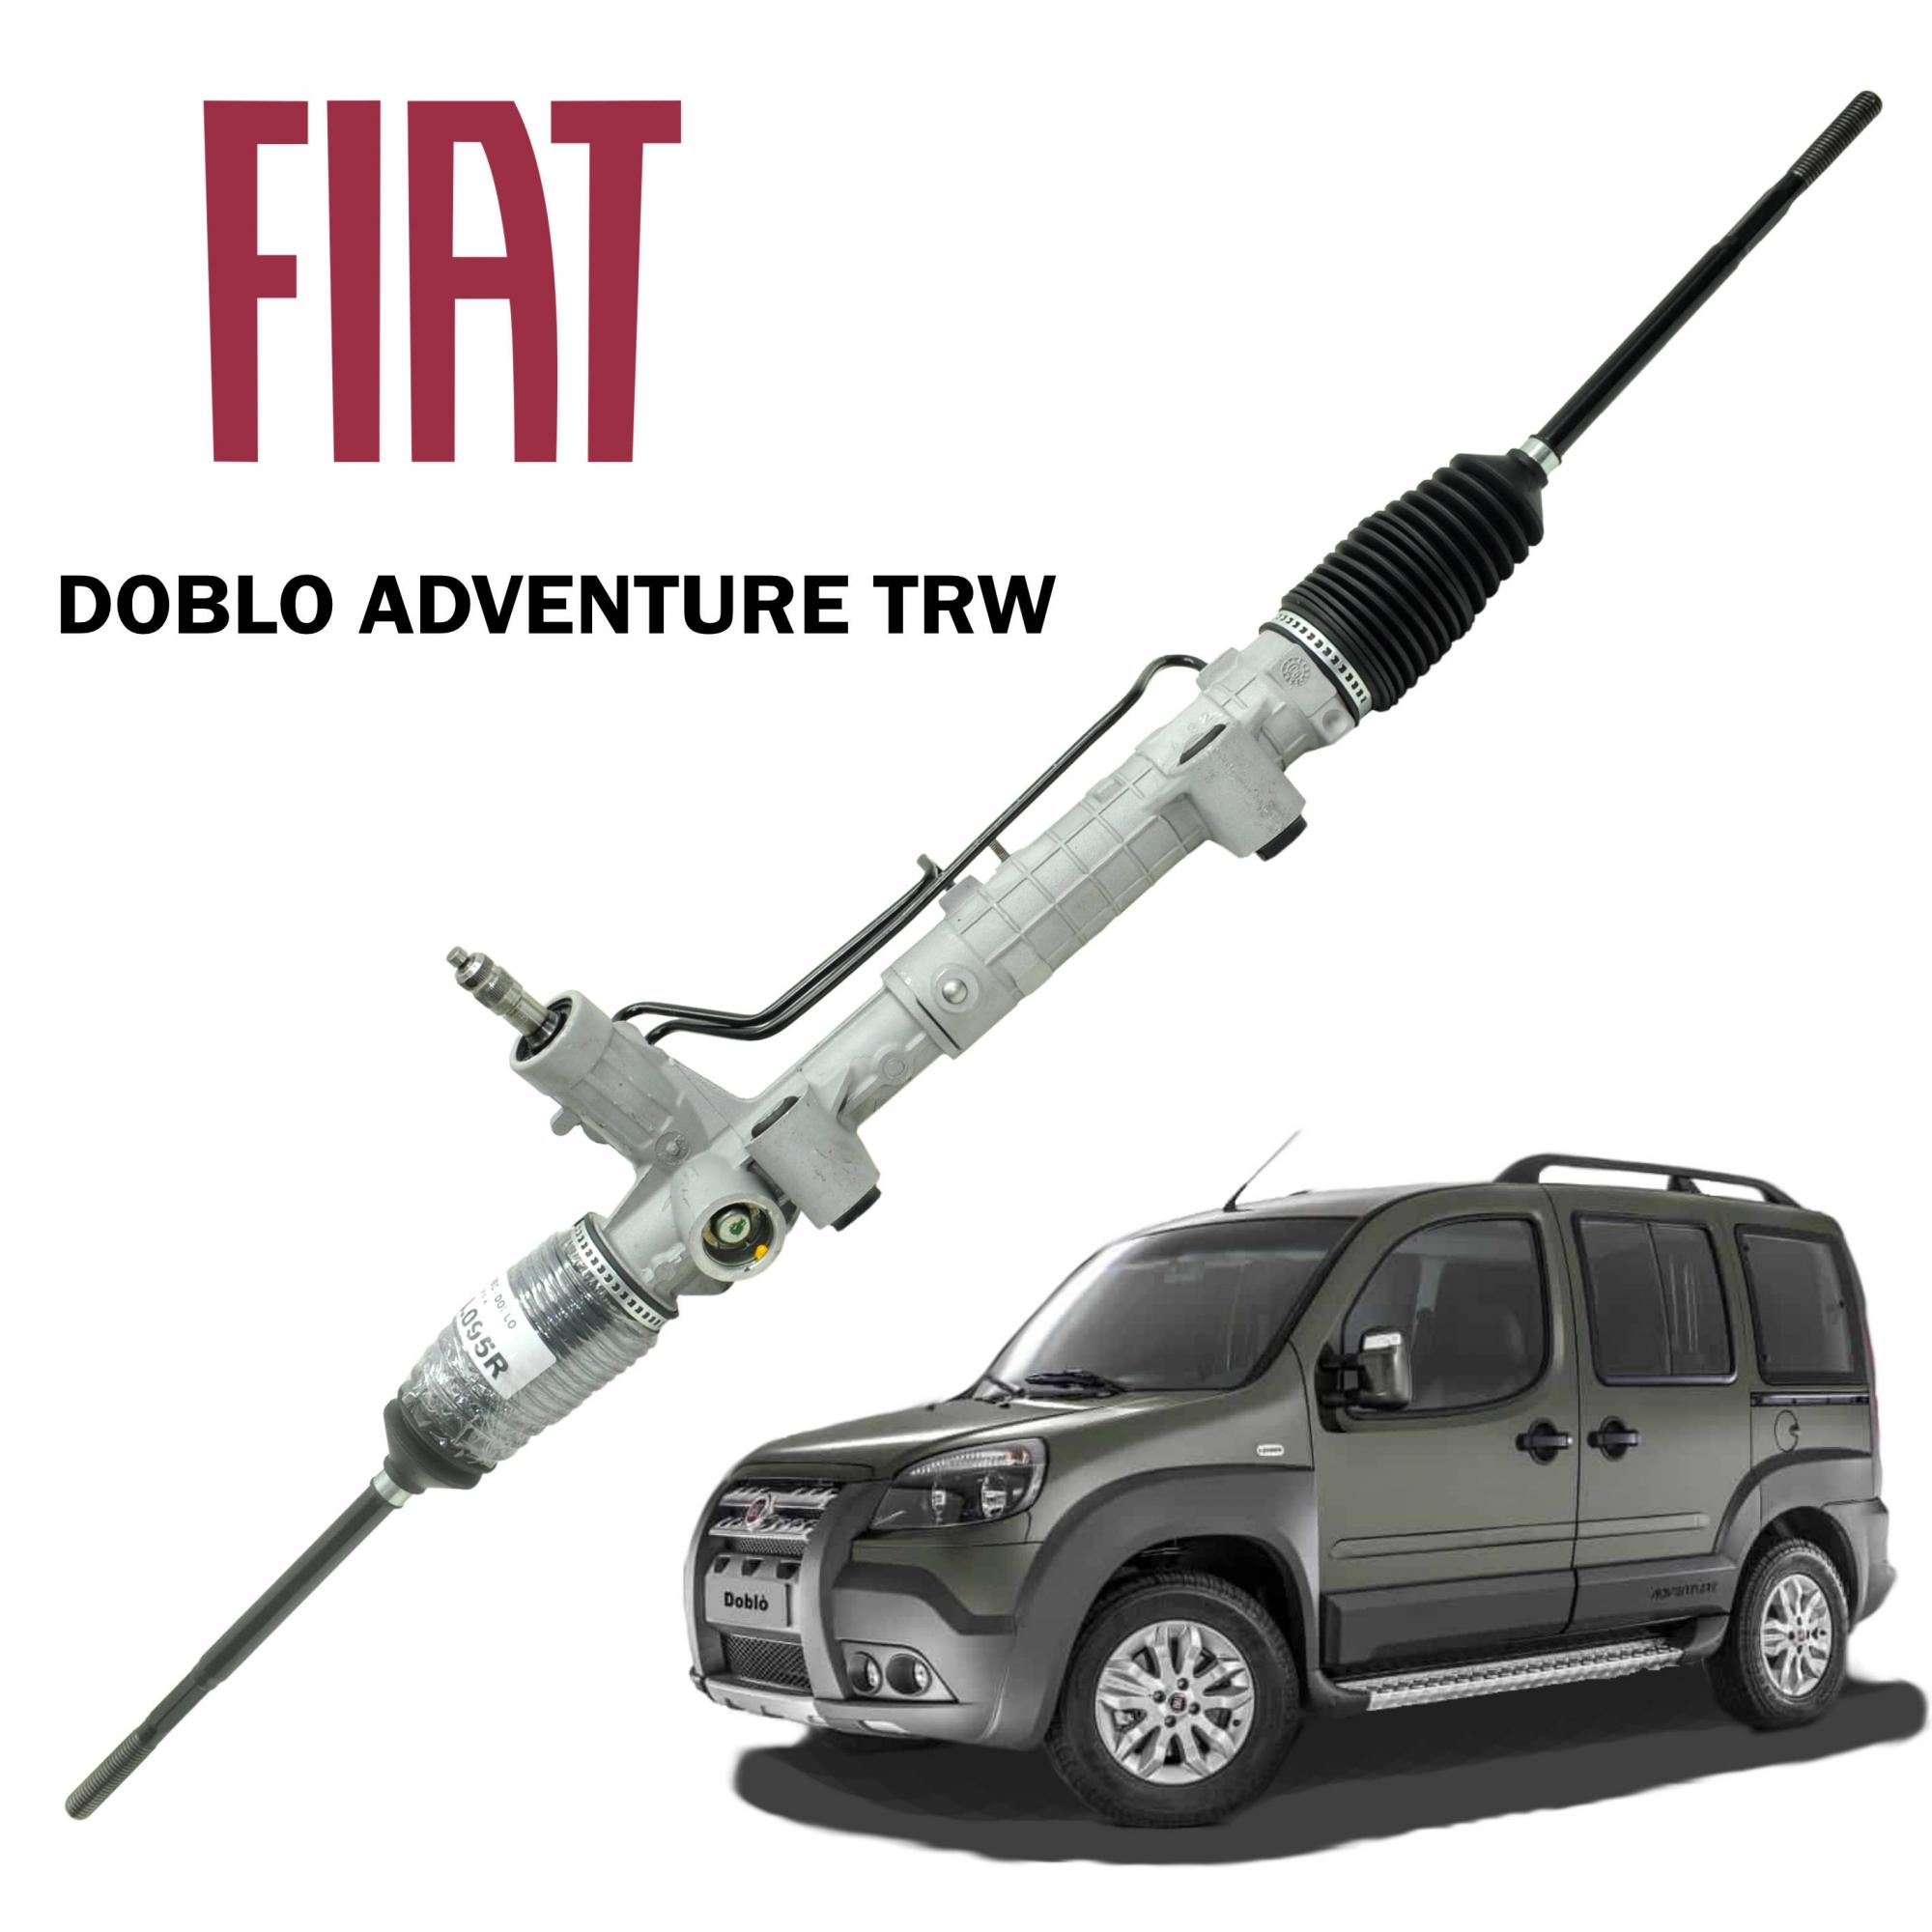 Caixa Direção Hidráulica TRW Doblo Adventure